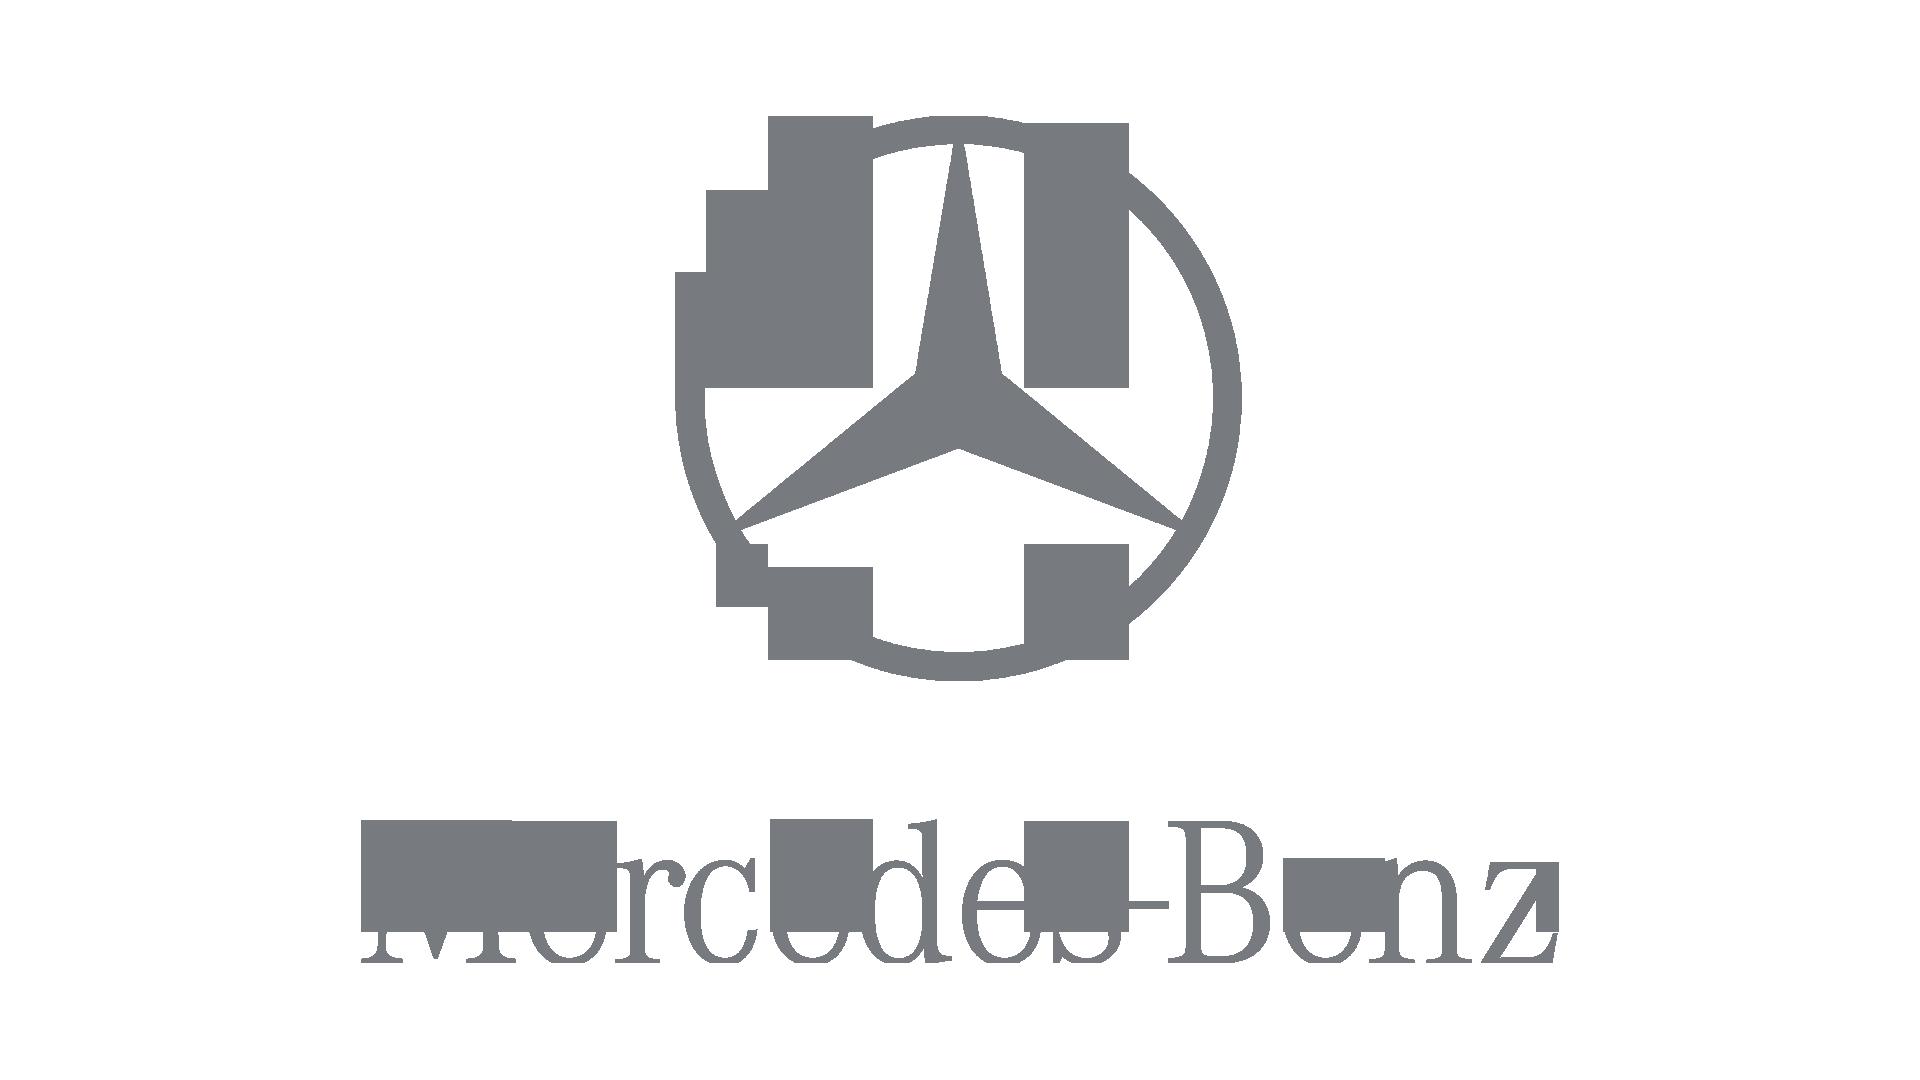 Mercedes-Benz-logo-2009-1920x1080.png